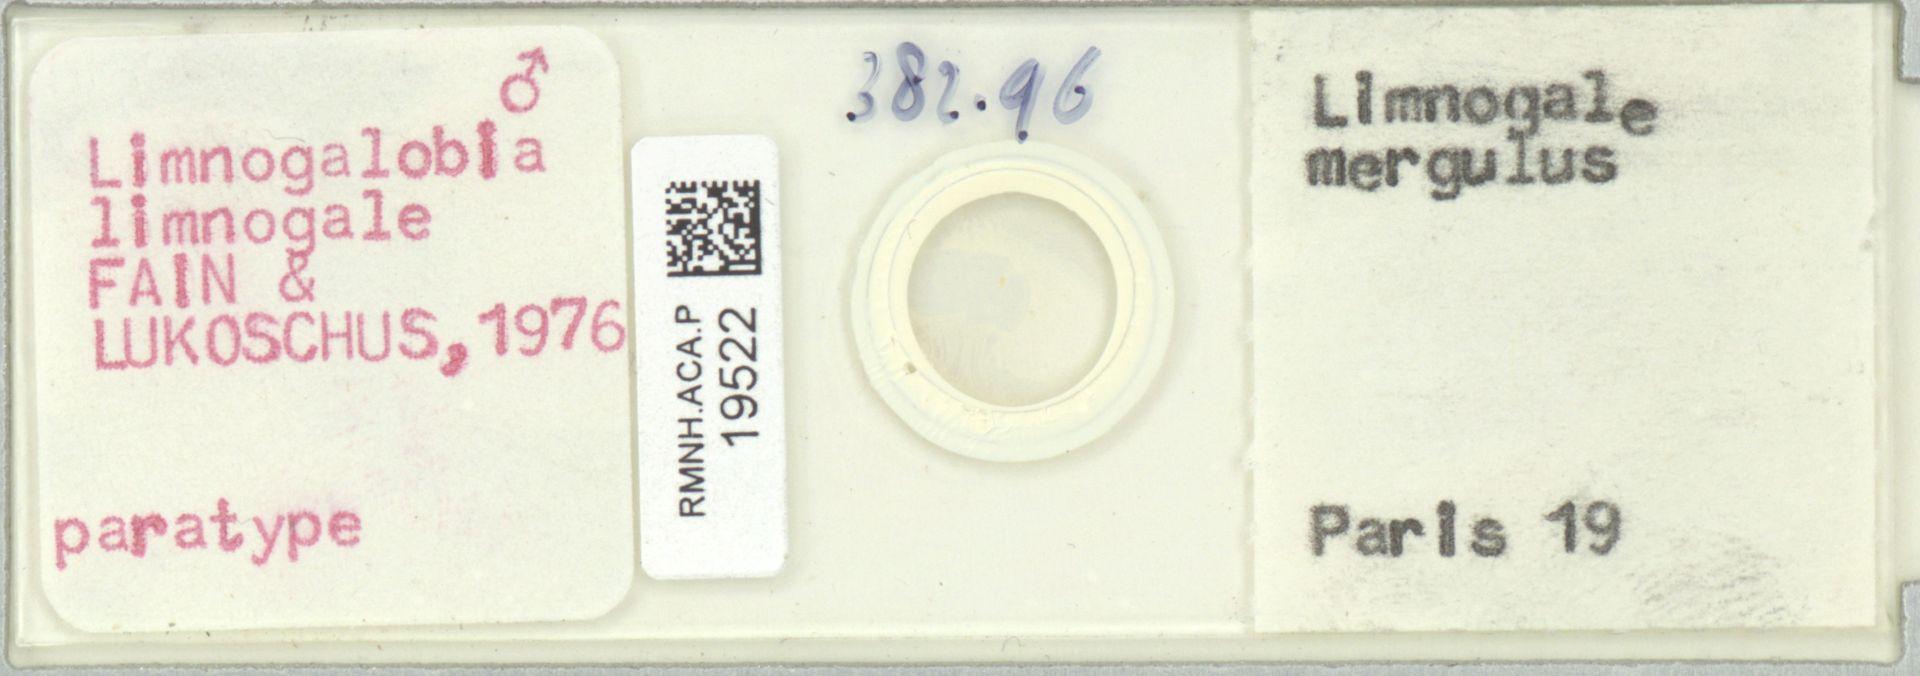 RMNH.ACA.P.19522 | Limnogalobia limnogale